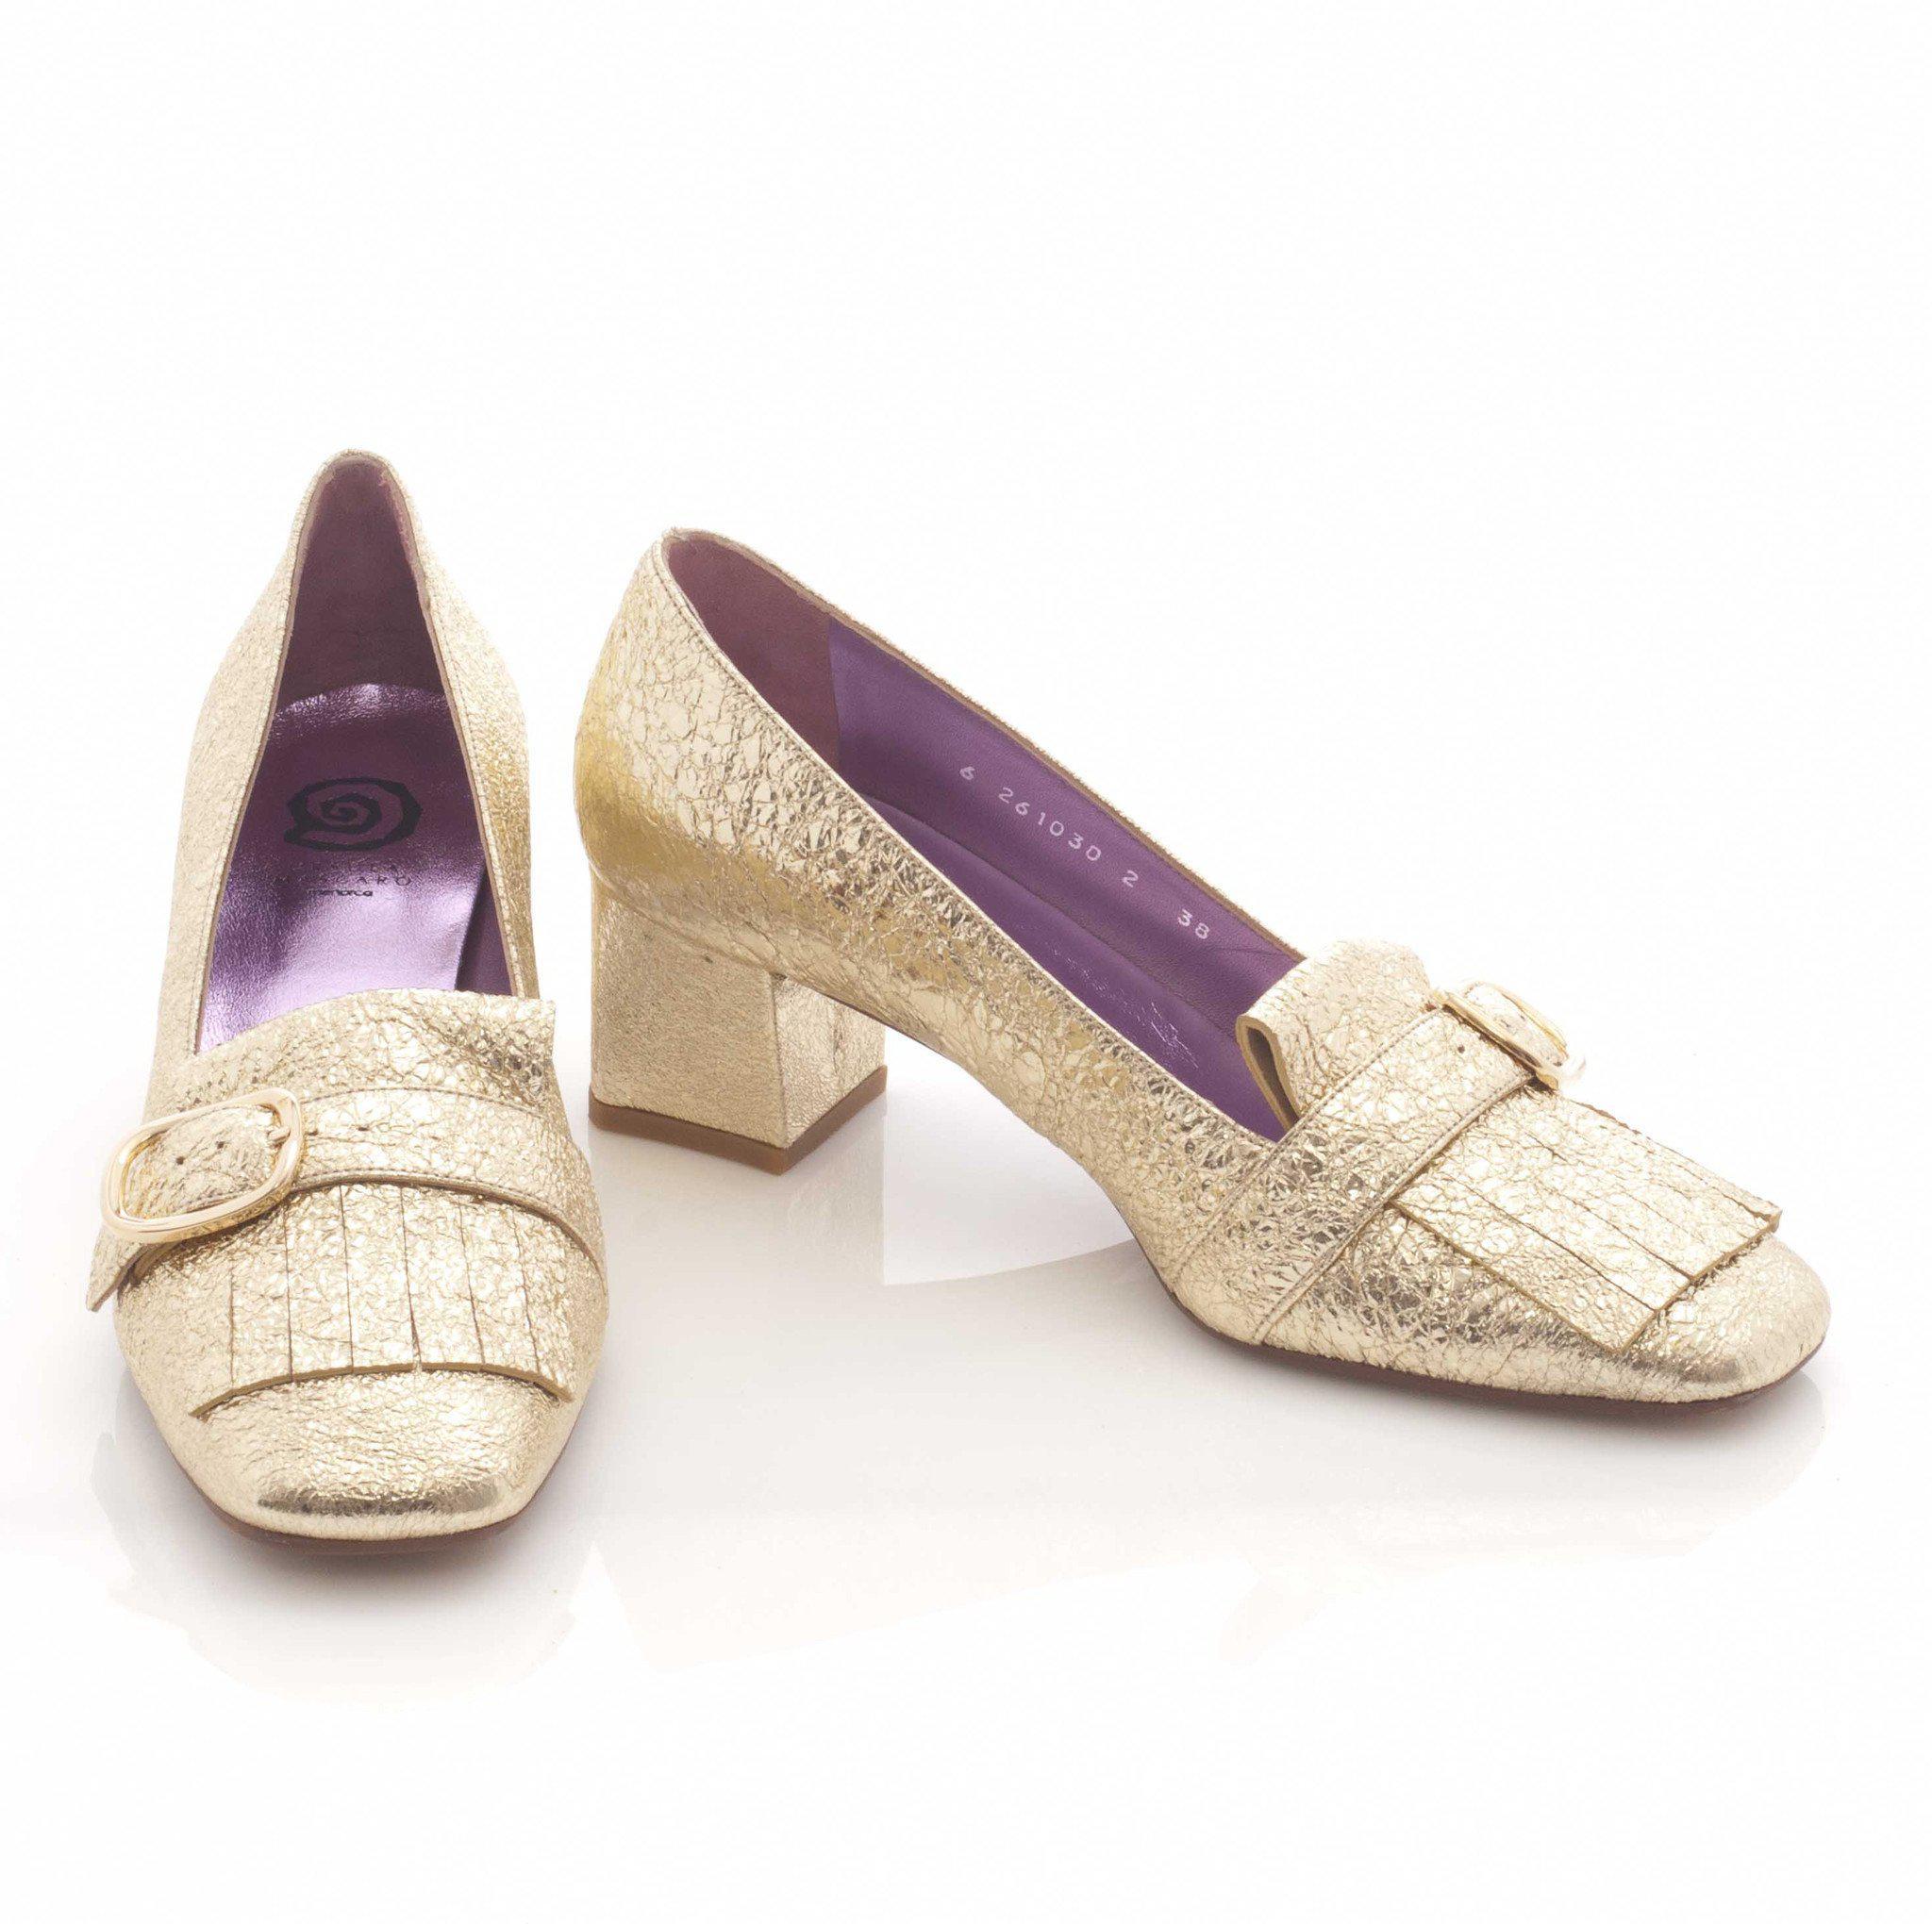 FOOTWEAR - Loafers Ursula Mascar OrUHcaqi